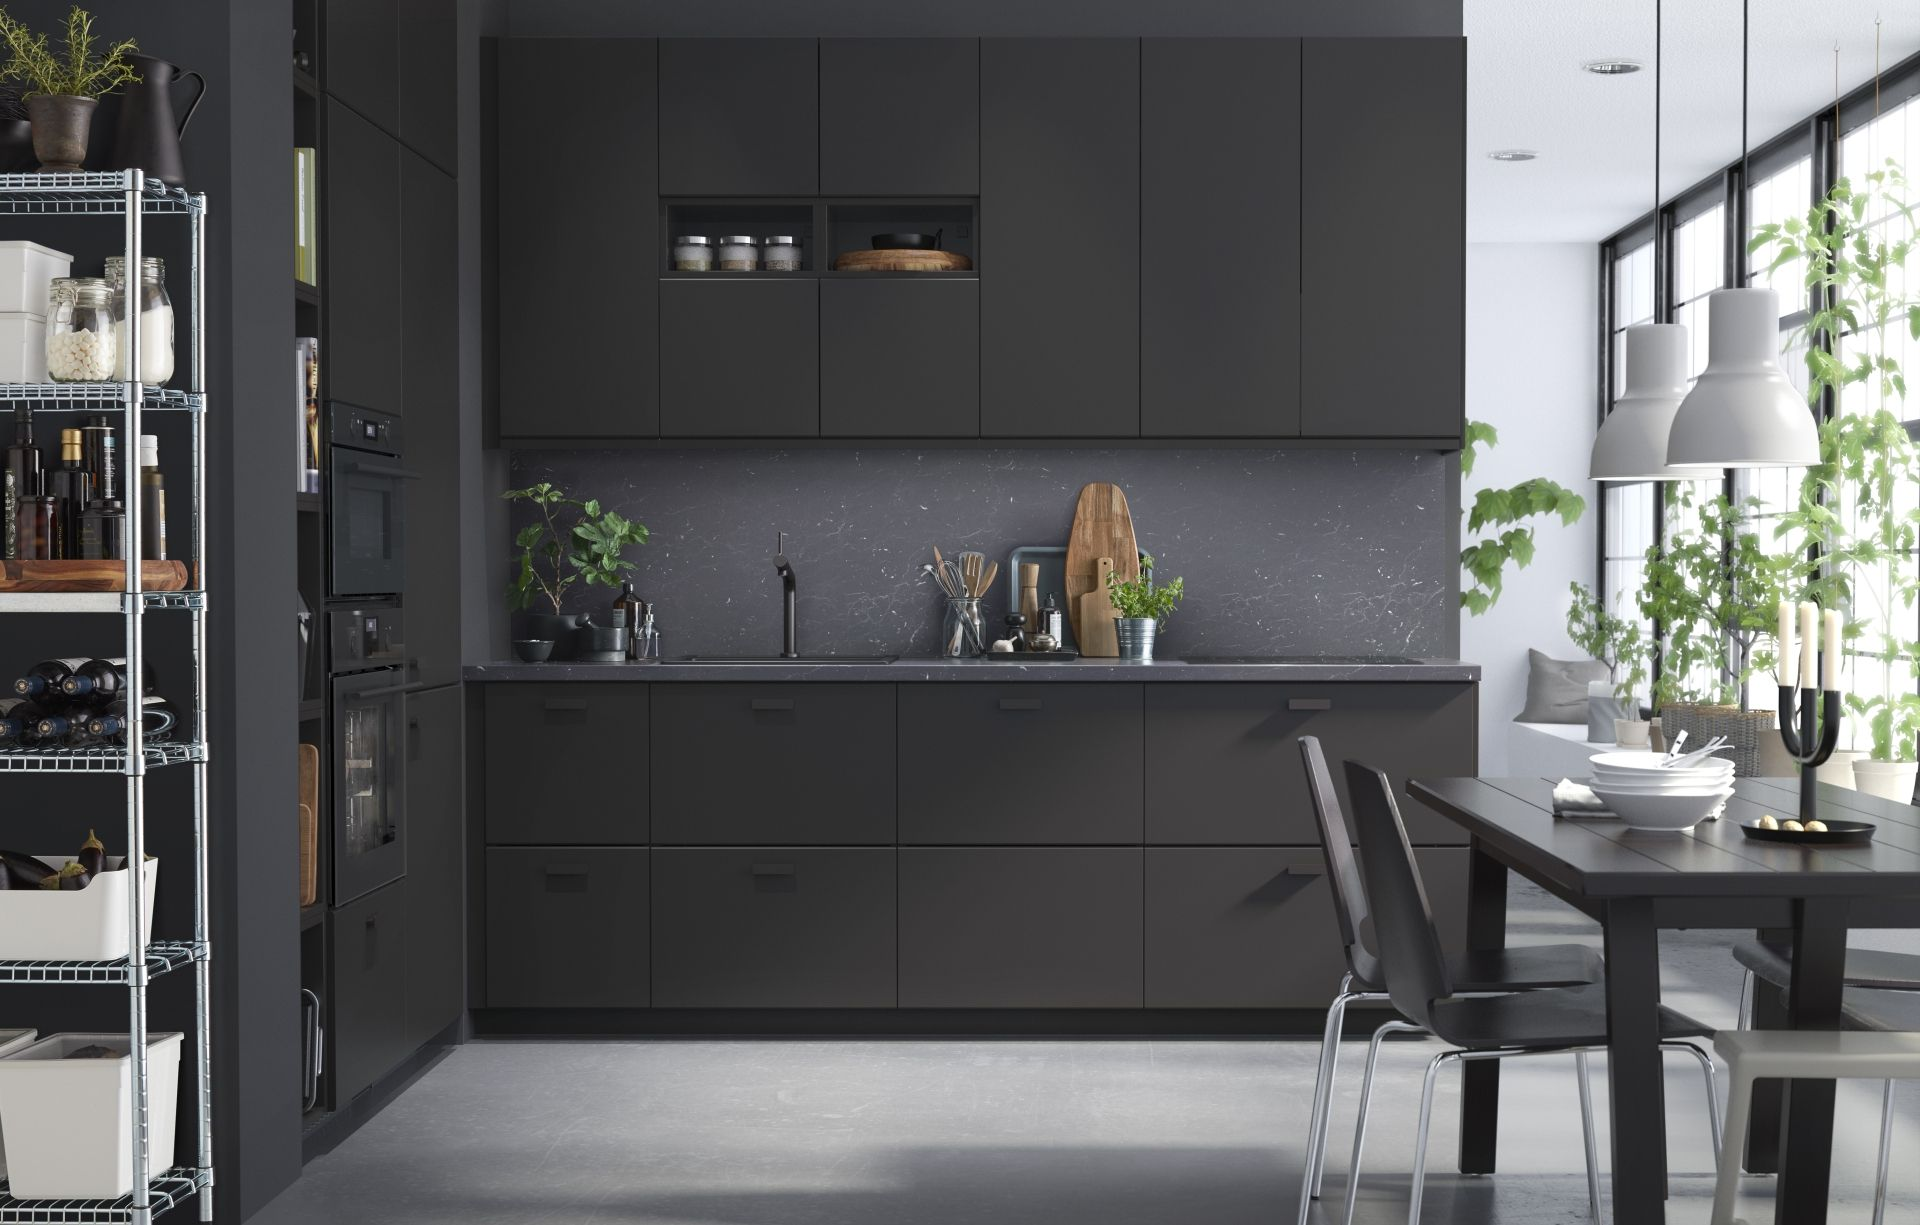 Keuken Interieur Scandinavisch : Metod kungsbacka keuken ikea ikeanederland ikeanl keukenfronten